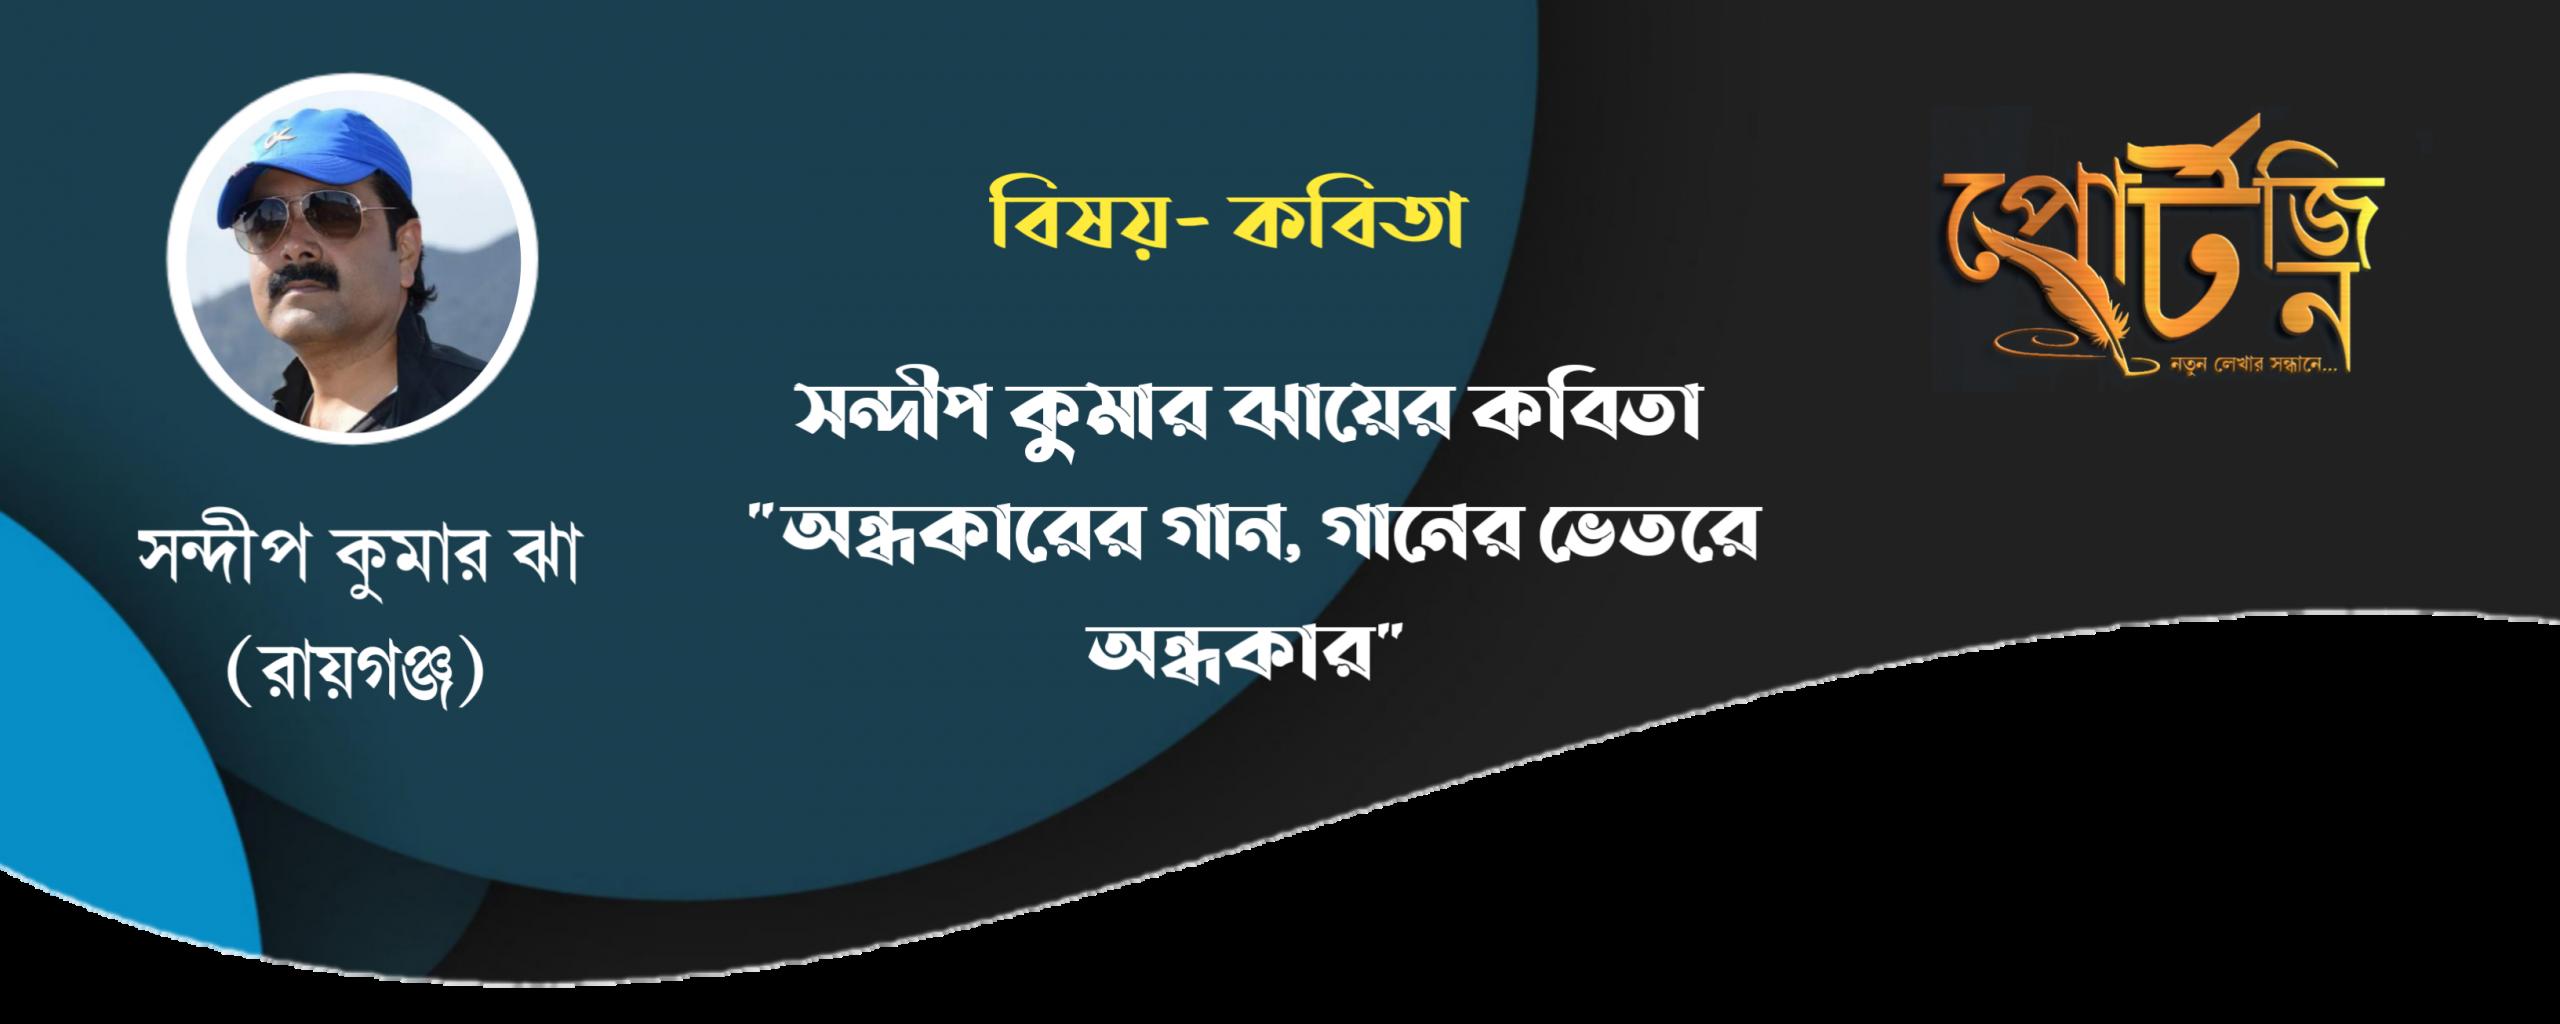 sandip jha bengal live portzine